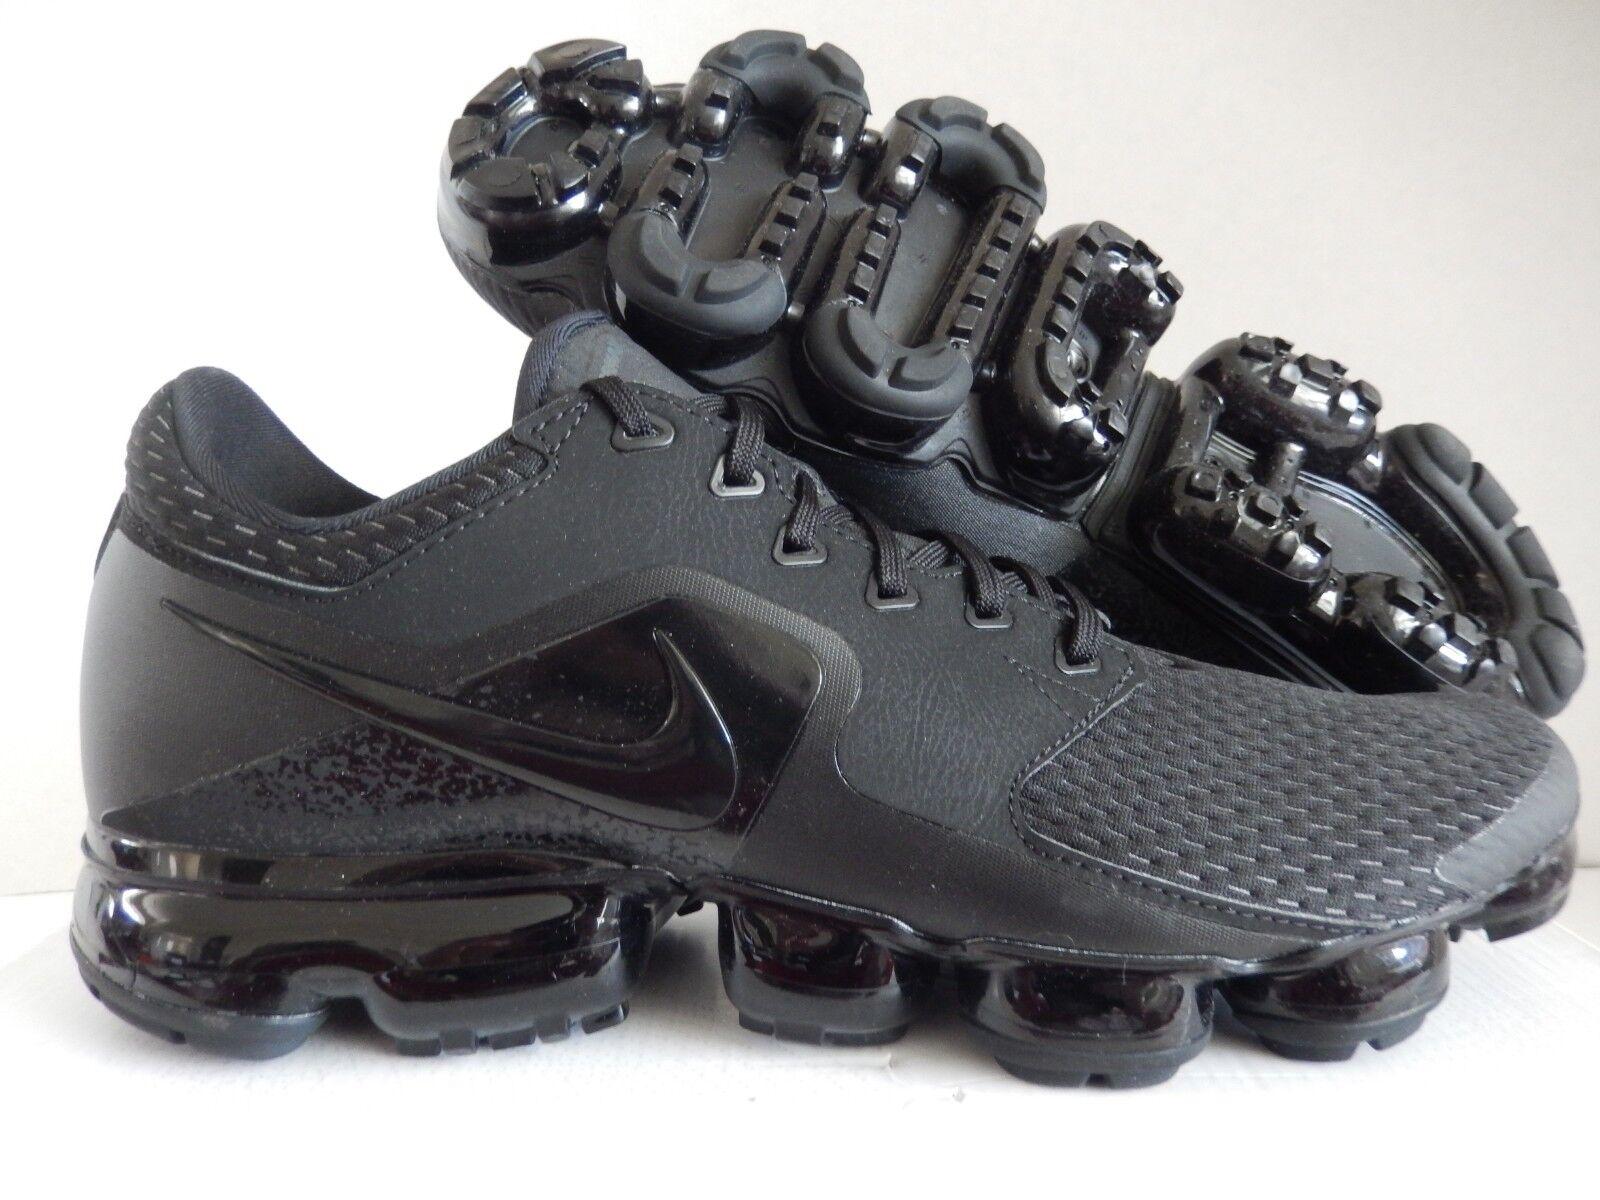 Nike air vapormax schwarz-schwarz-anthracite sz 12 Damenss-mens sz 10,5 [ah9045-002]